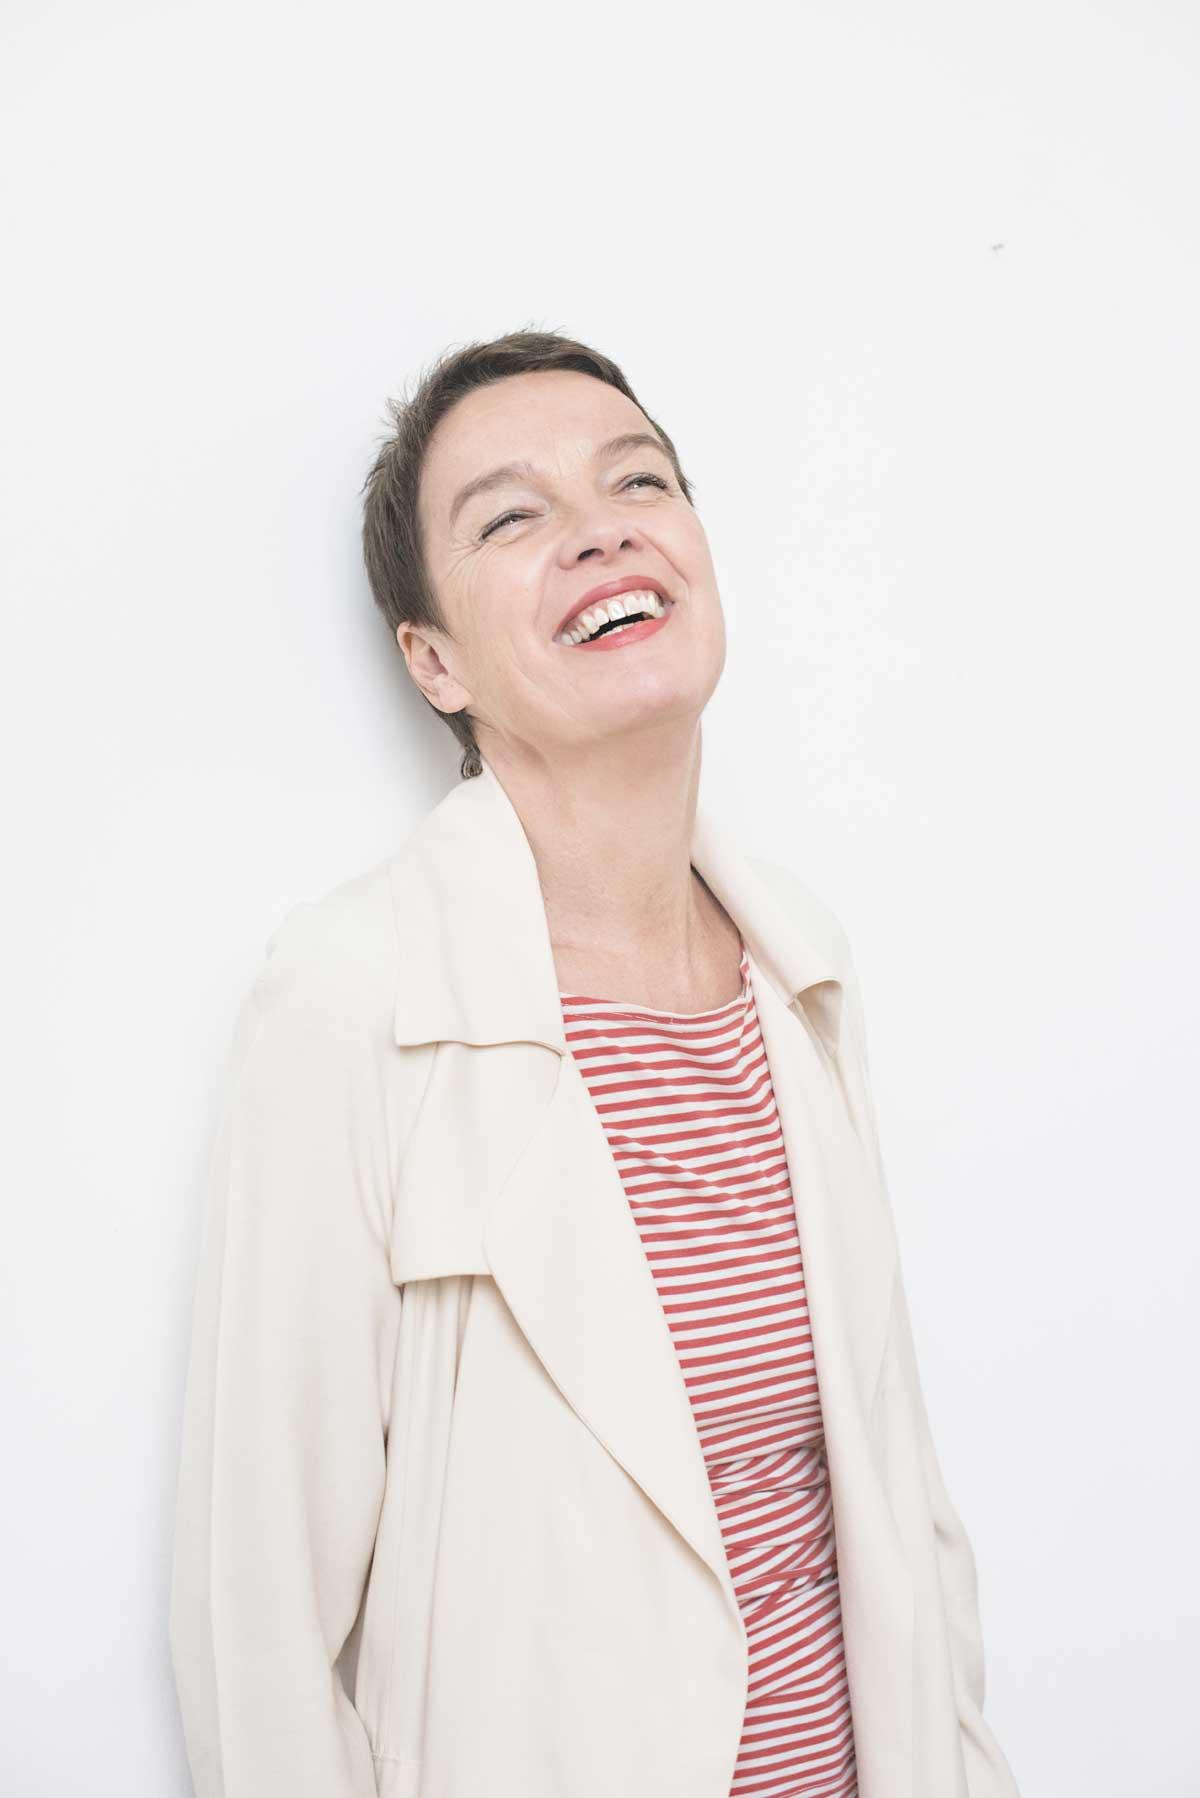 Franziska Maderthaner (Foto by Sabine Hauswirth)